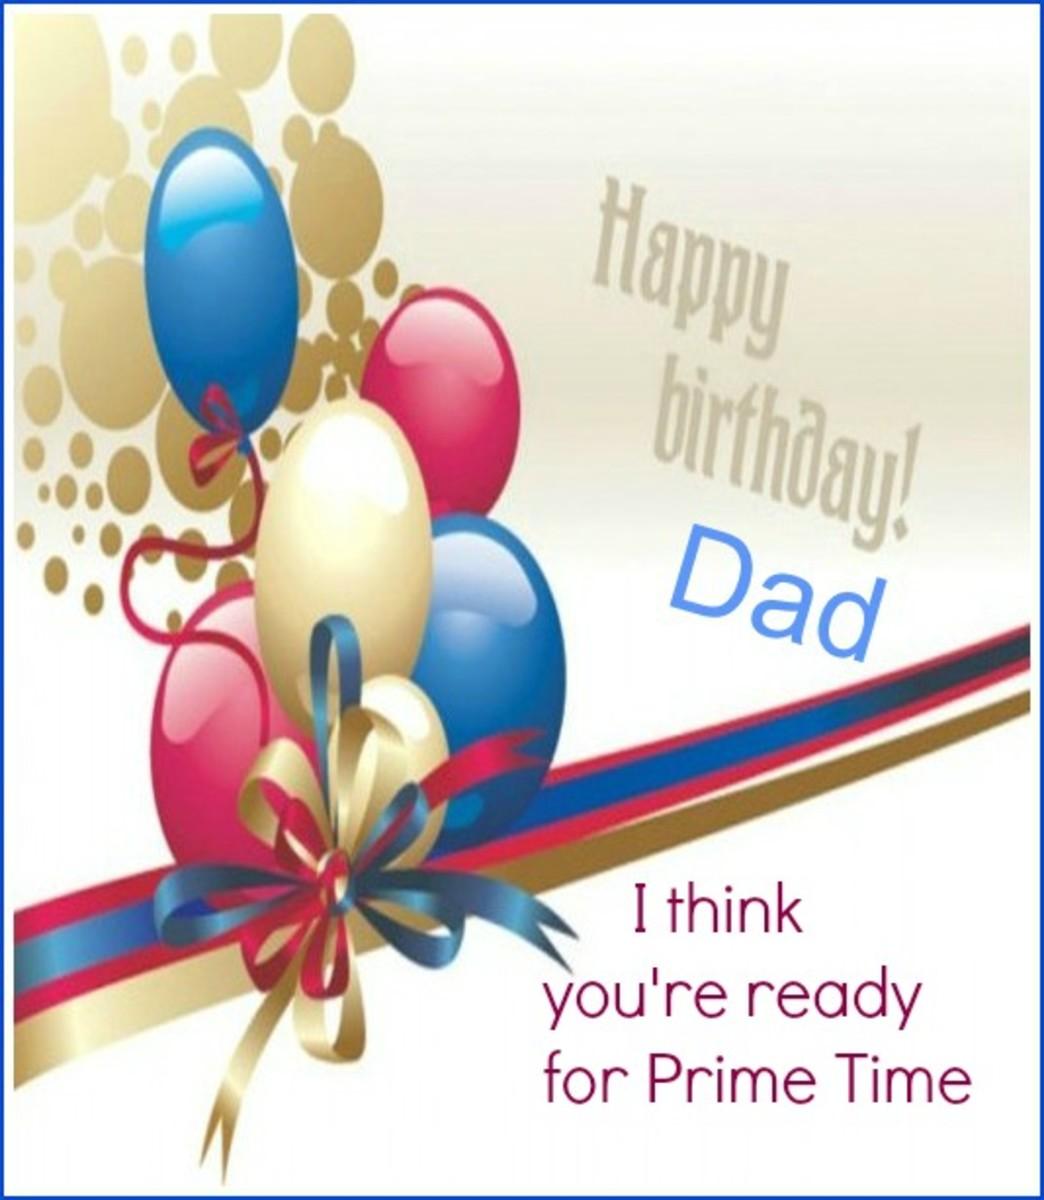 Dad Email Birthday Card